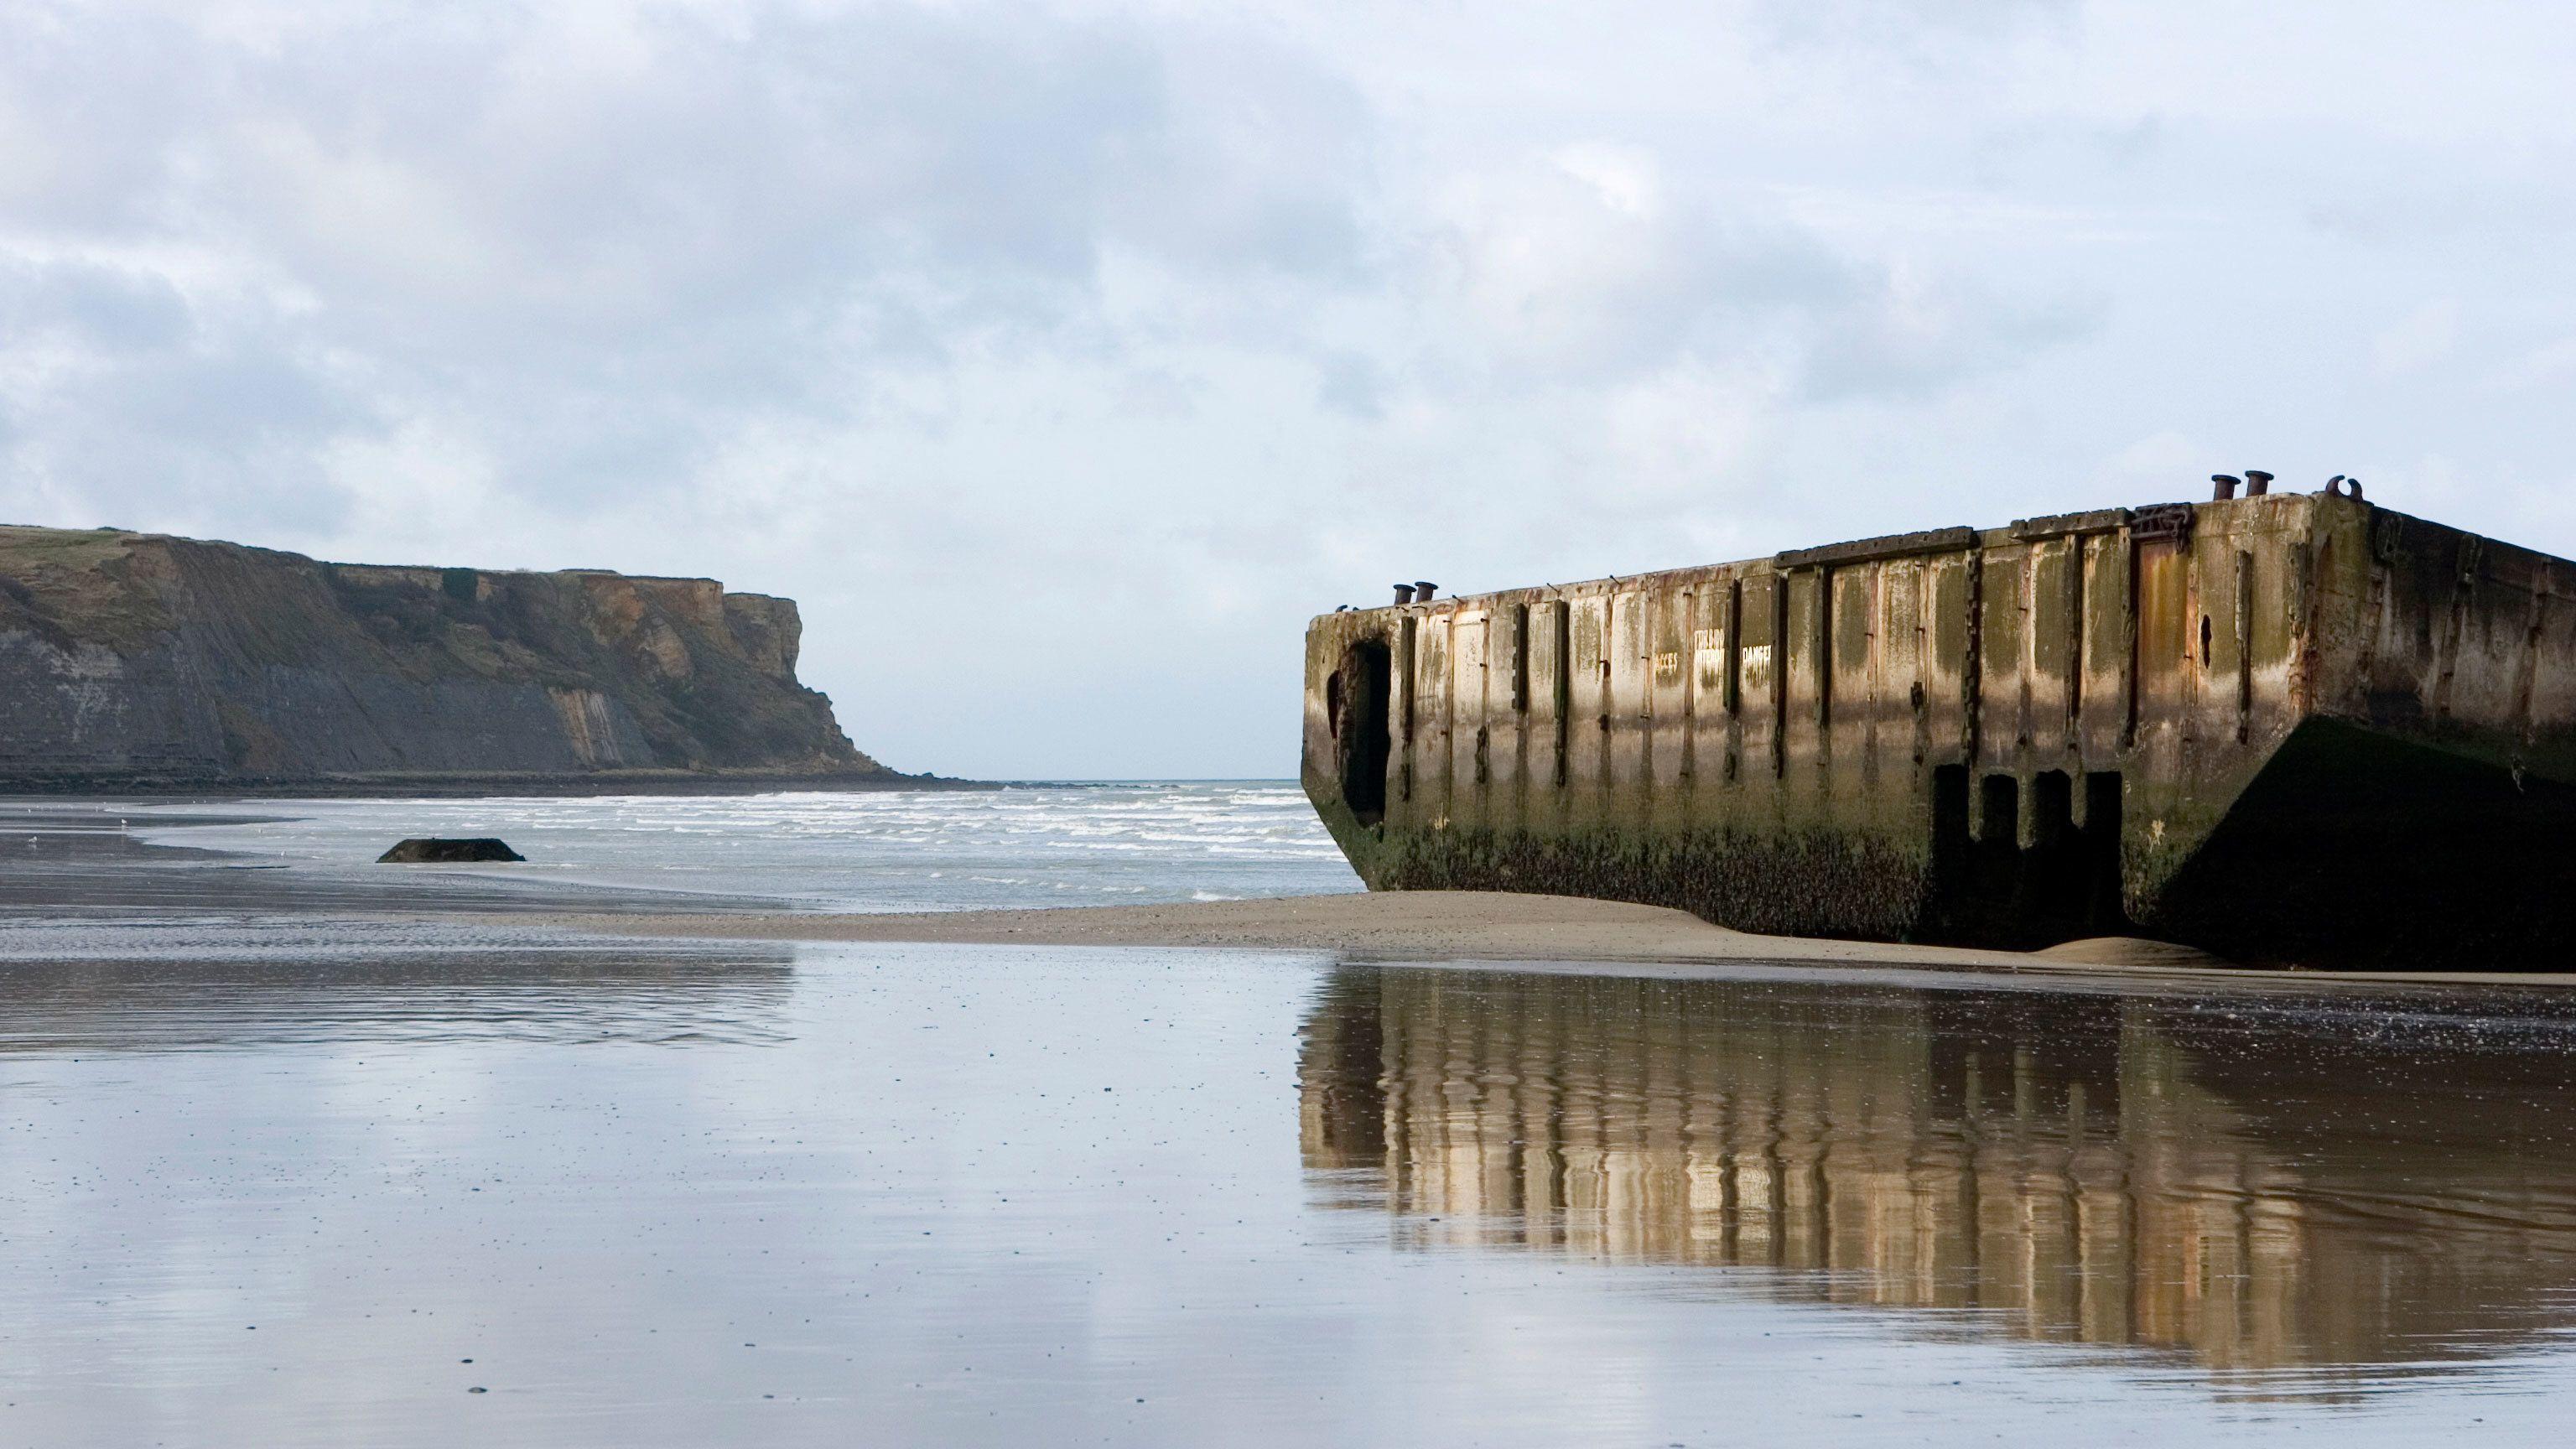 abandoned barge on beach